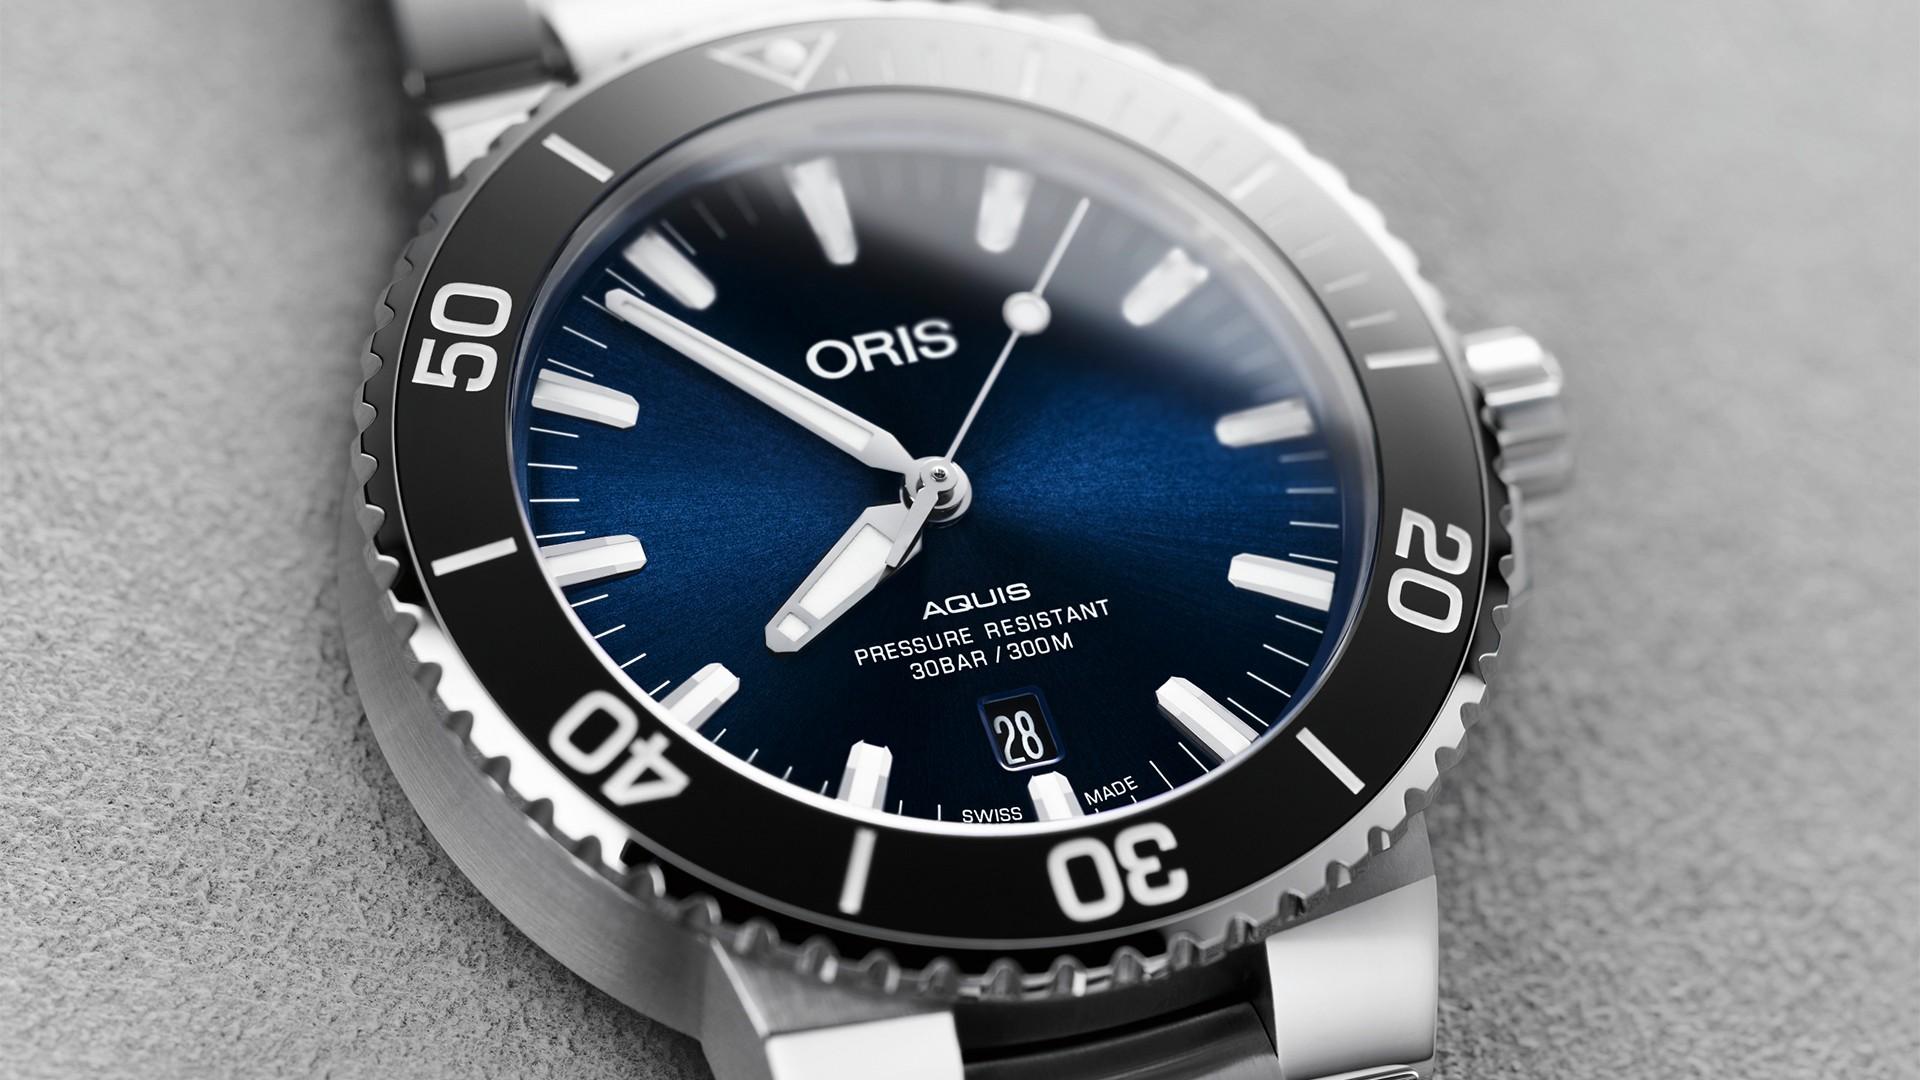 Oris Aquis dive watch